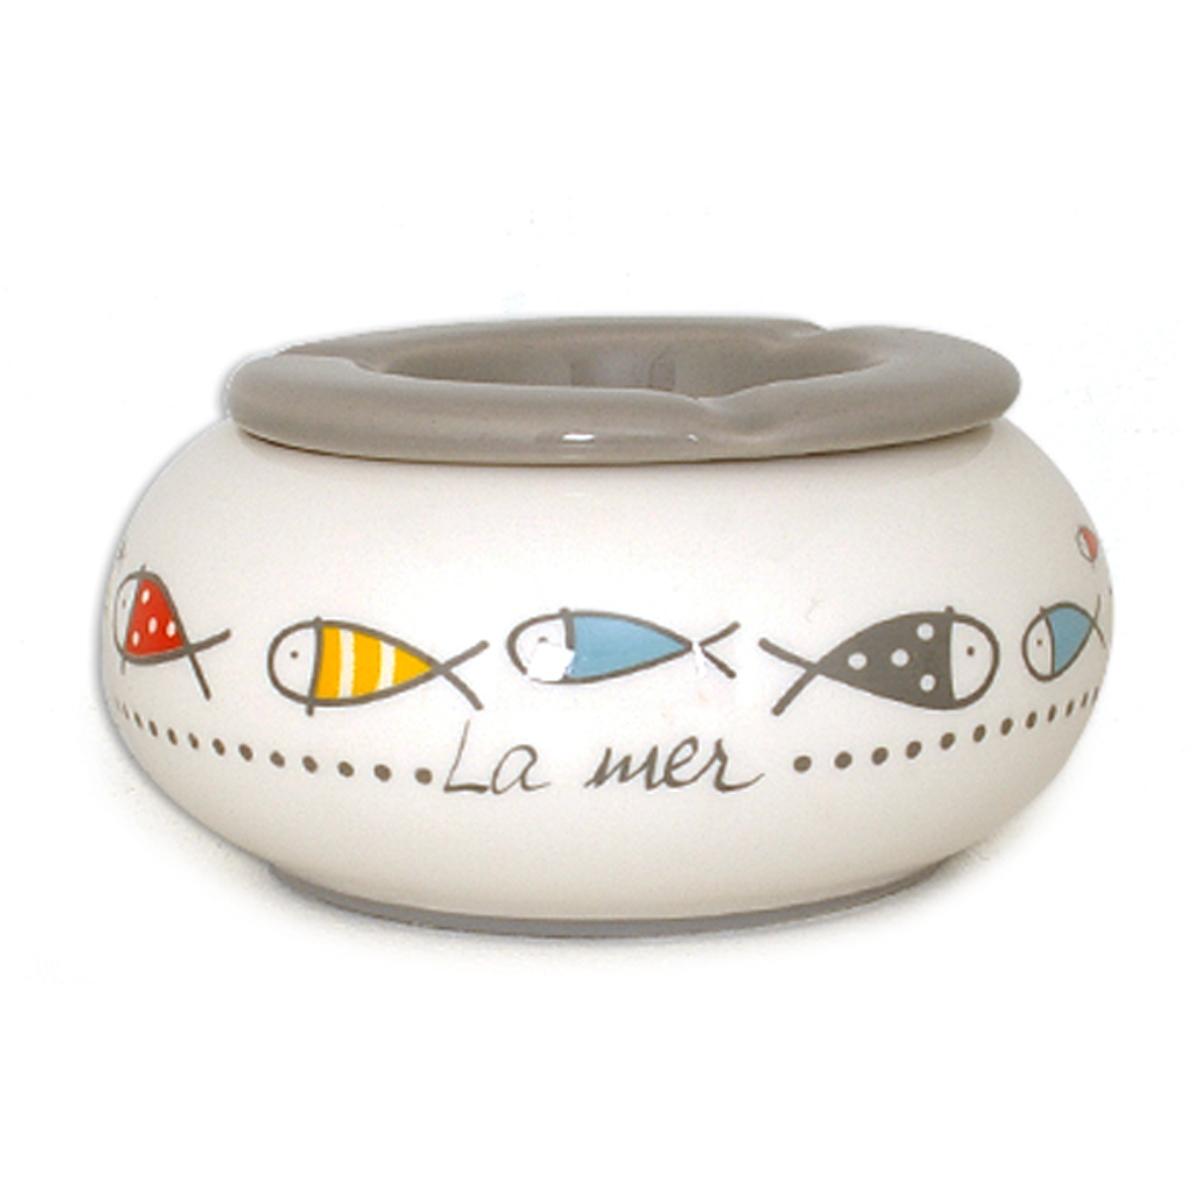 Cendrier marocain céramique \'Poisssons - La Mer\' multicolore - 15x8 cm - [A1130]